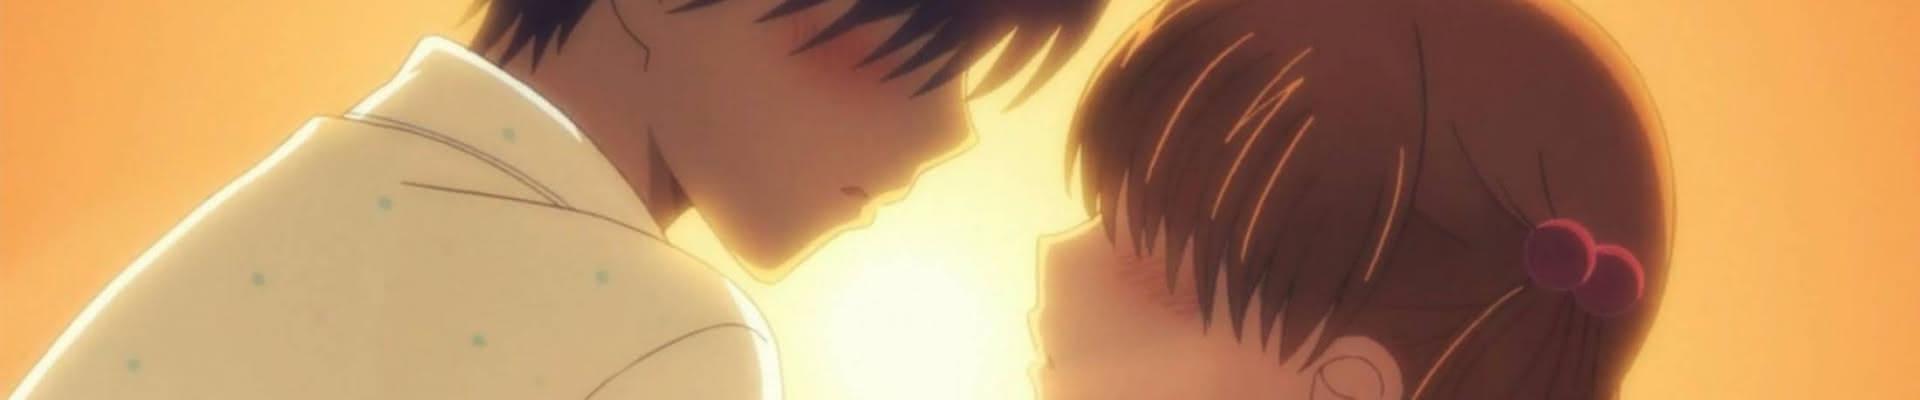 12-Sai. ~Chiccha na Mune no Tokimeki~